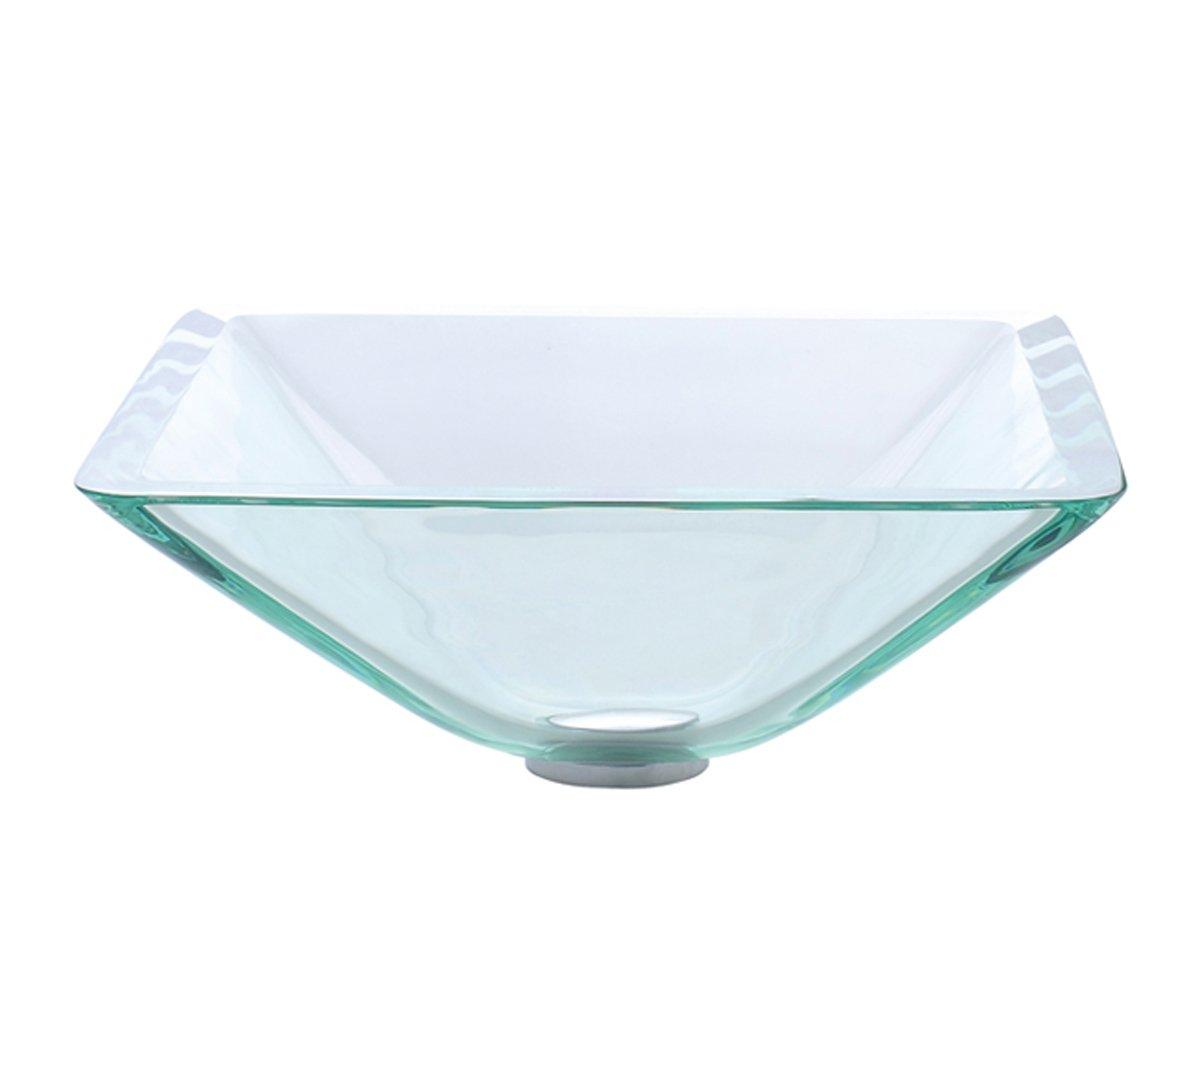 Kraus GVS 901 19mm Aquamarine Square Clear Glass Vessel Bathroom Sink      Amazon.com